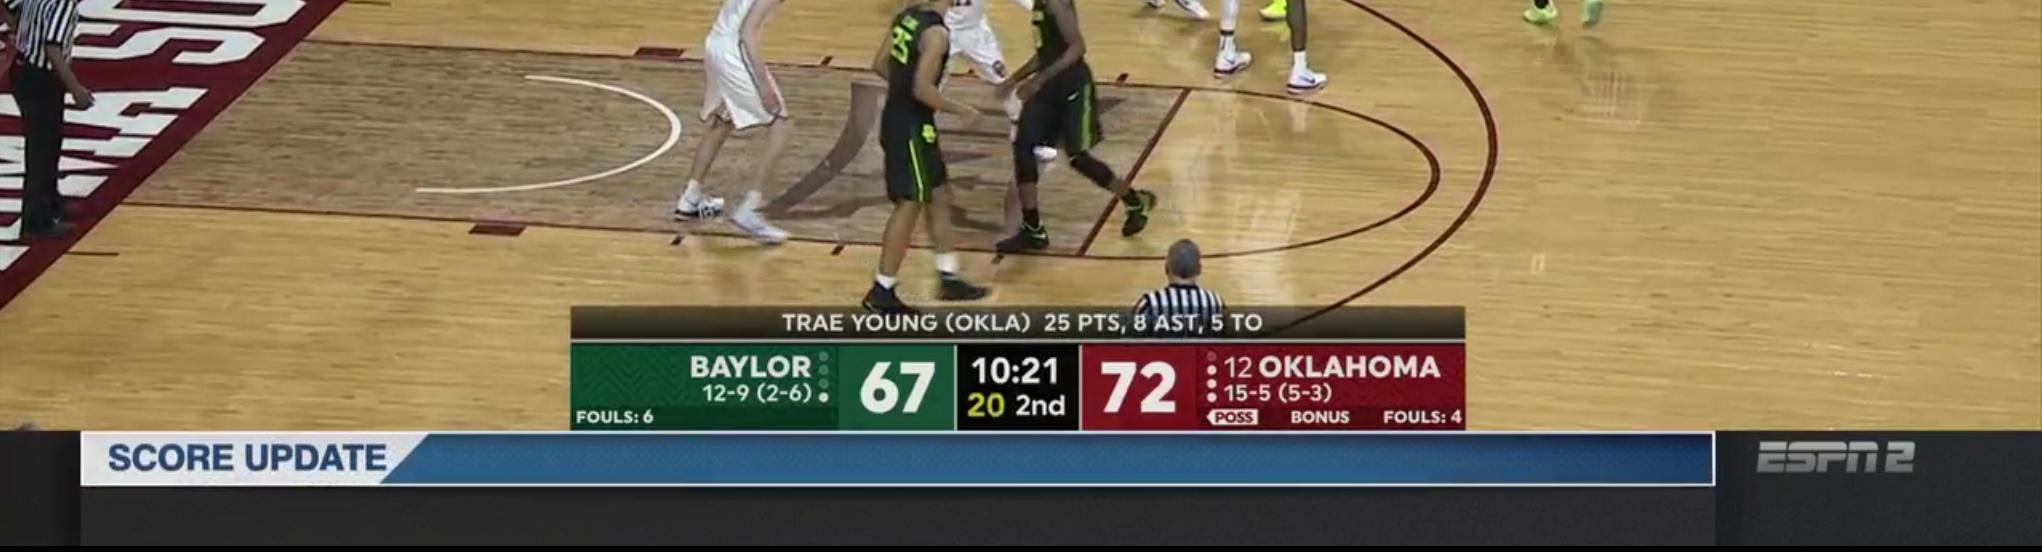 Another New Espn Graphics Package For College Basketball Sport Center Tvnewstalk Net